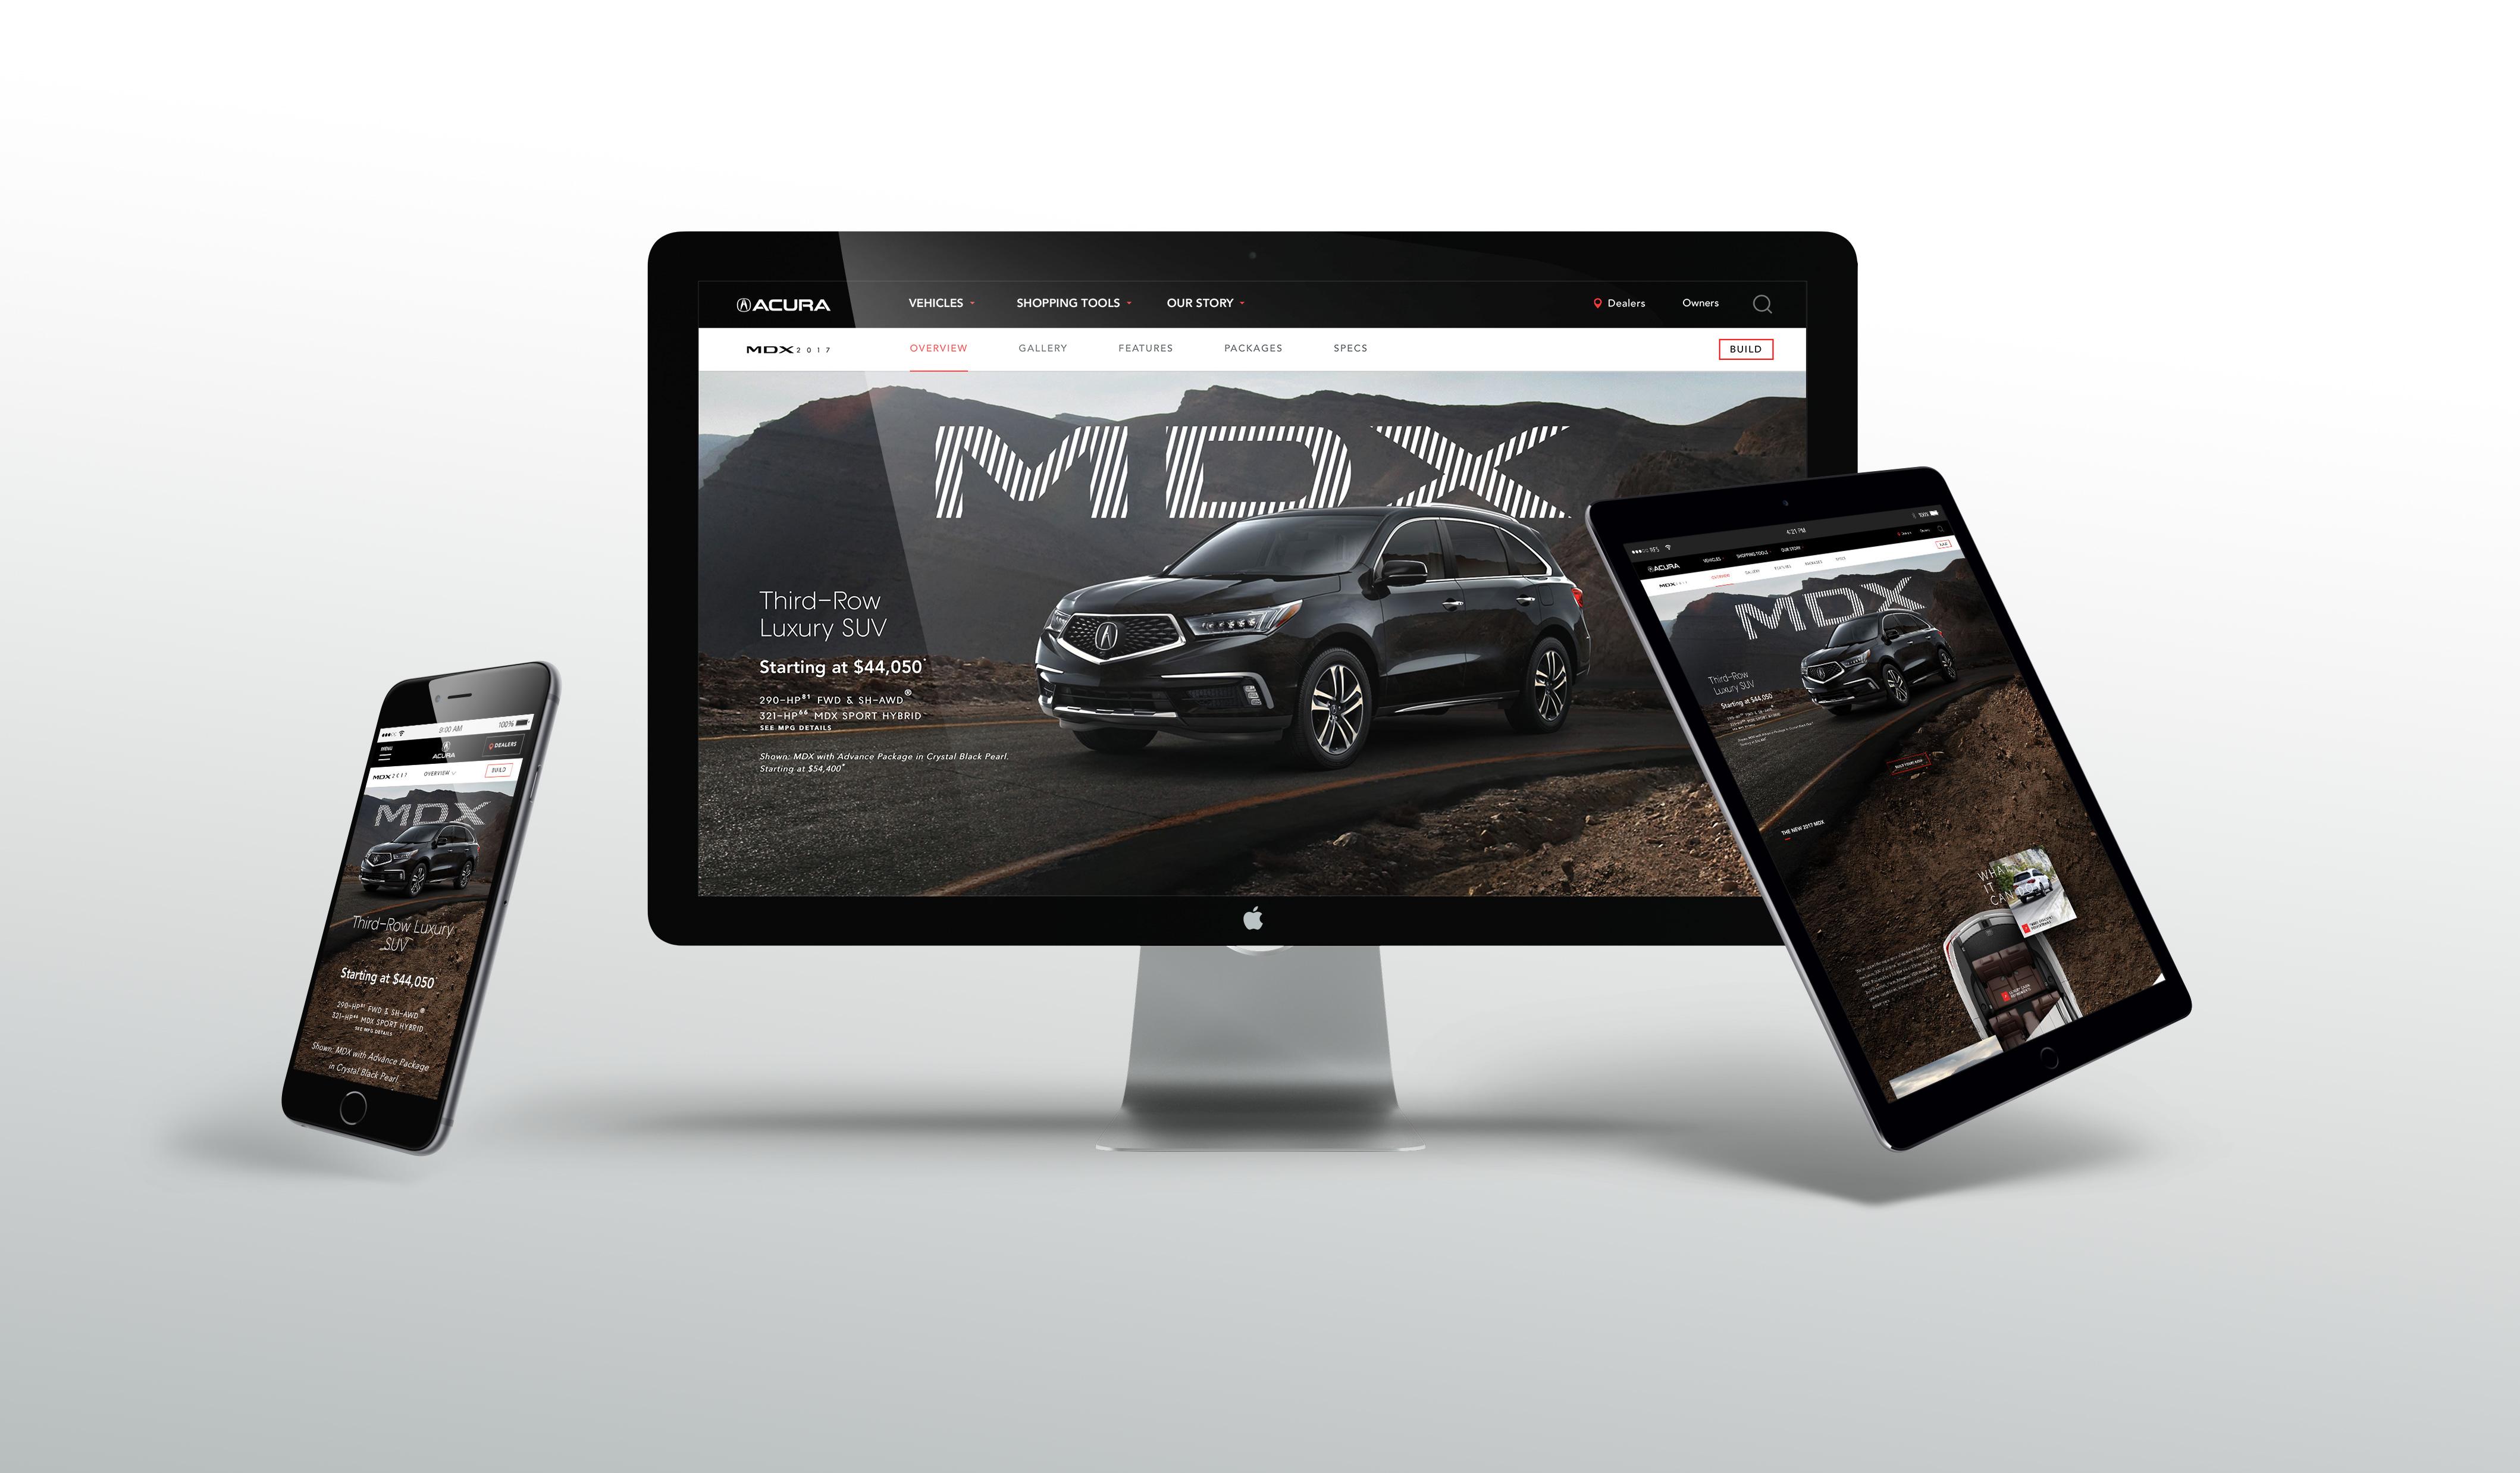 MDX_3_device-lockup_001